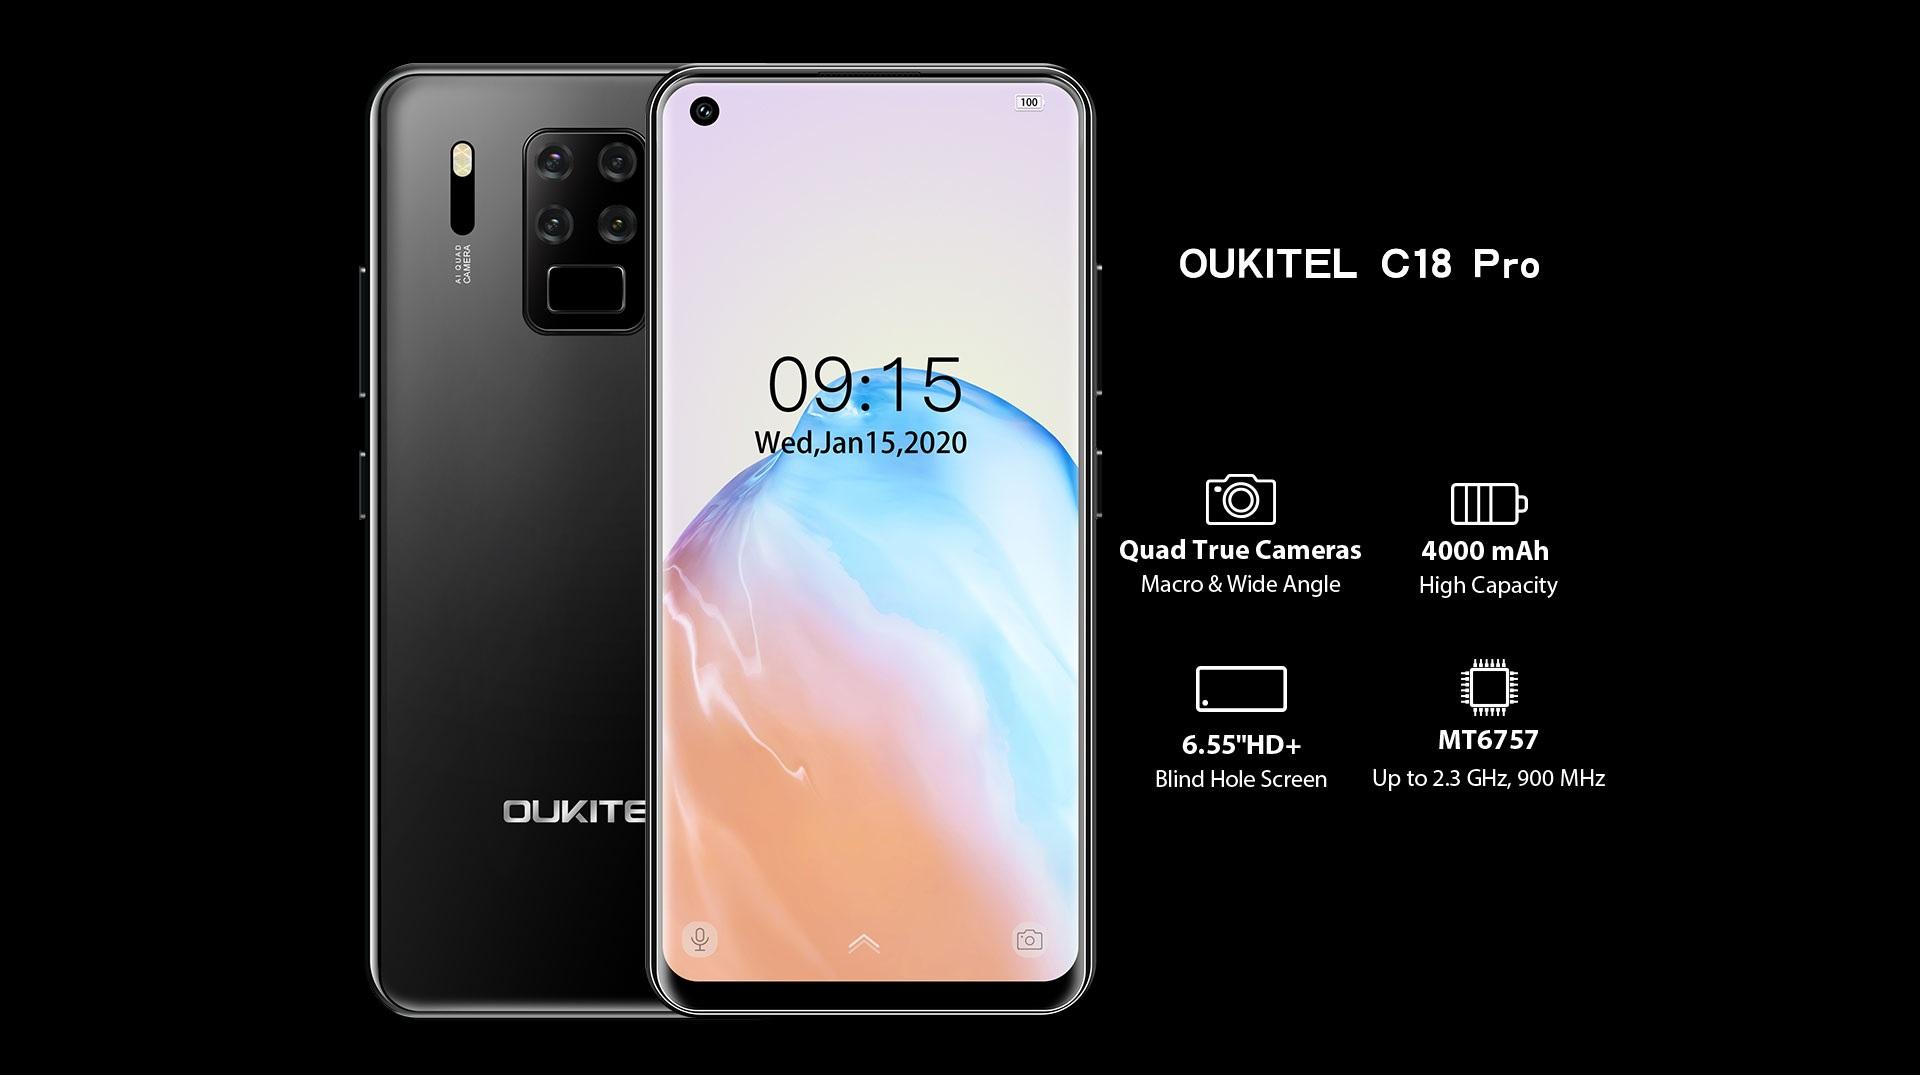 Oukitel C18 Pro smartphone